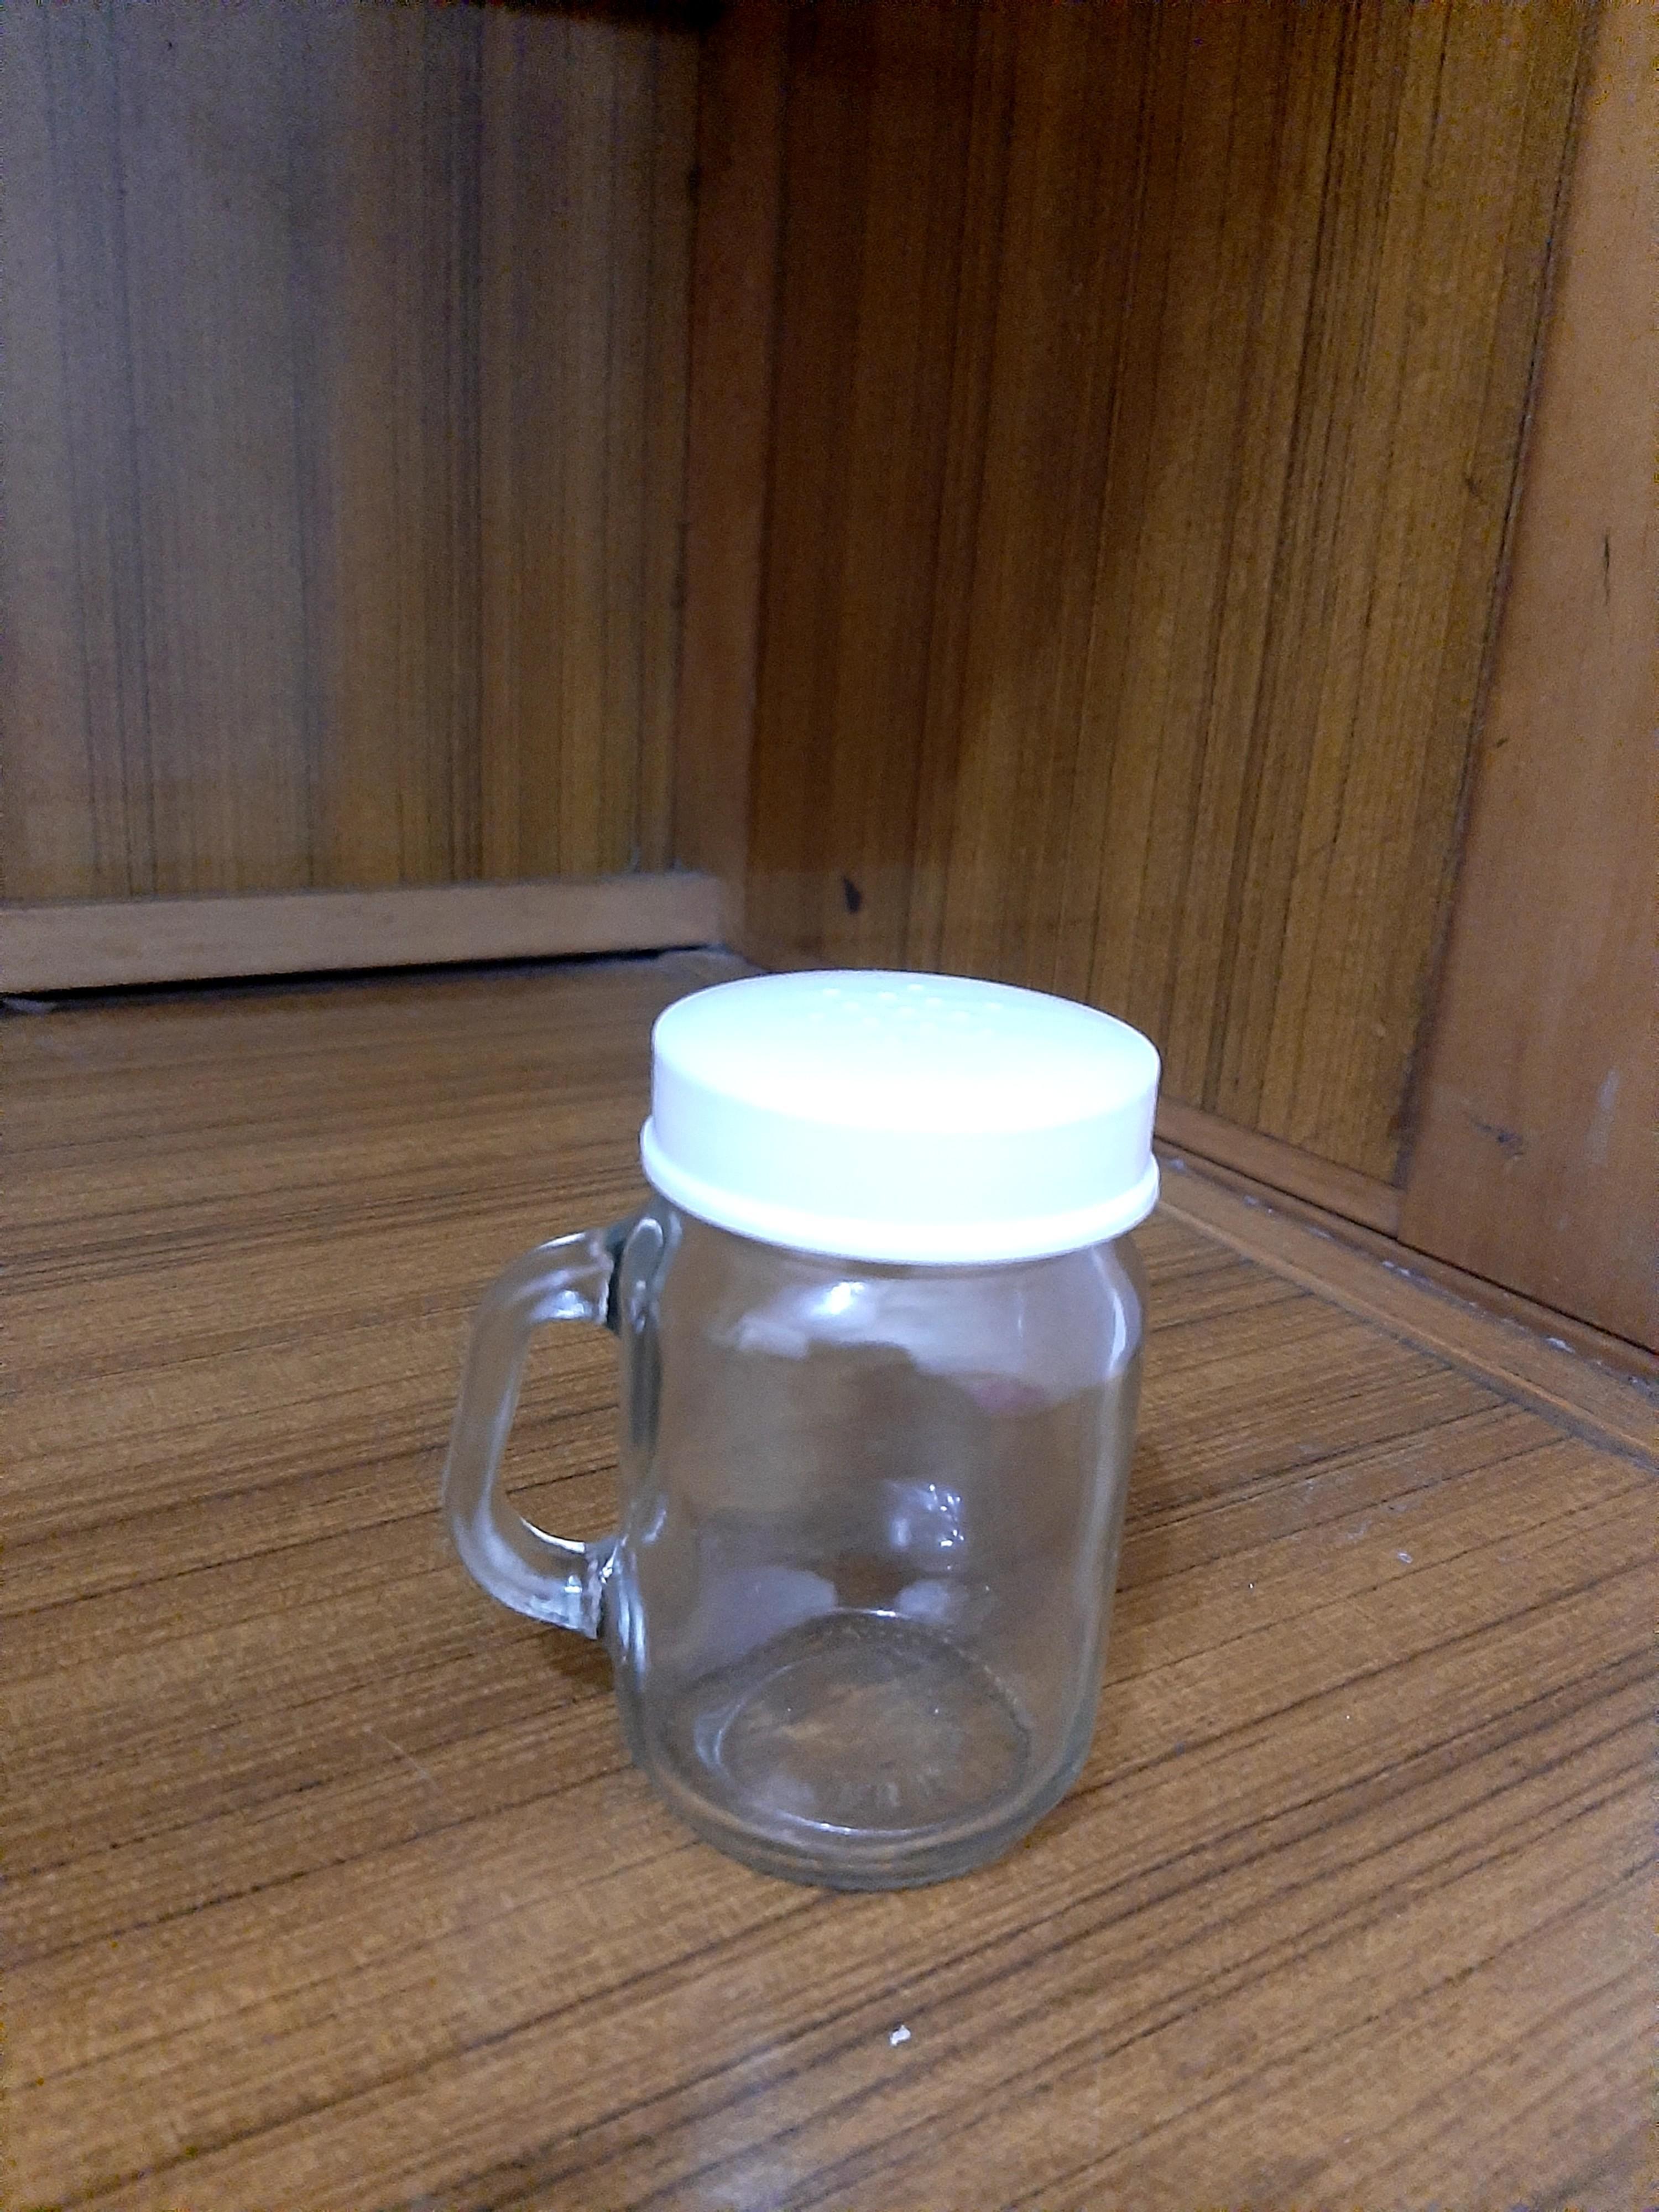 Botol/Toples Lada/Garam/Bumbu Dapur